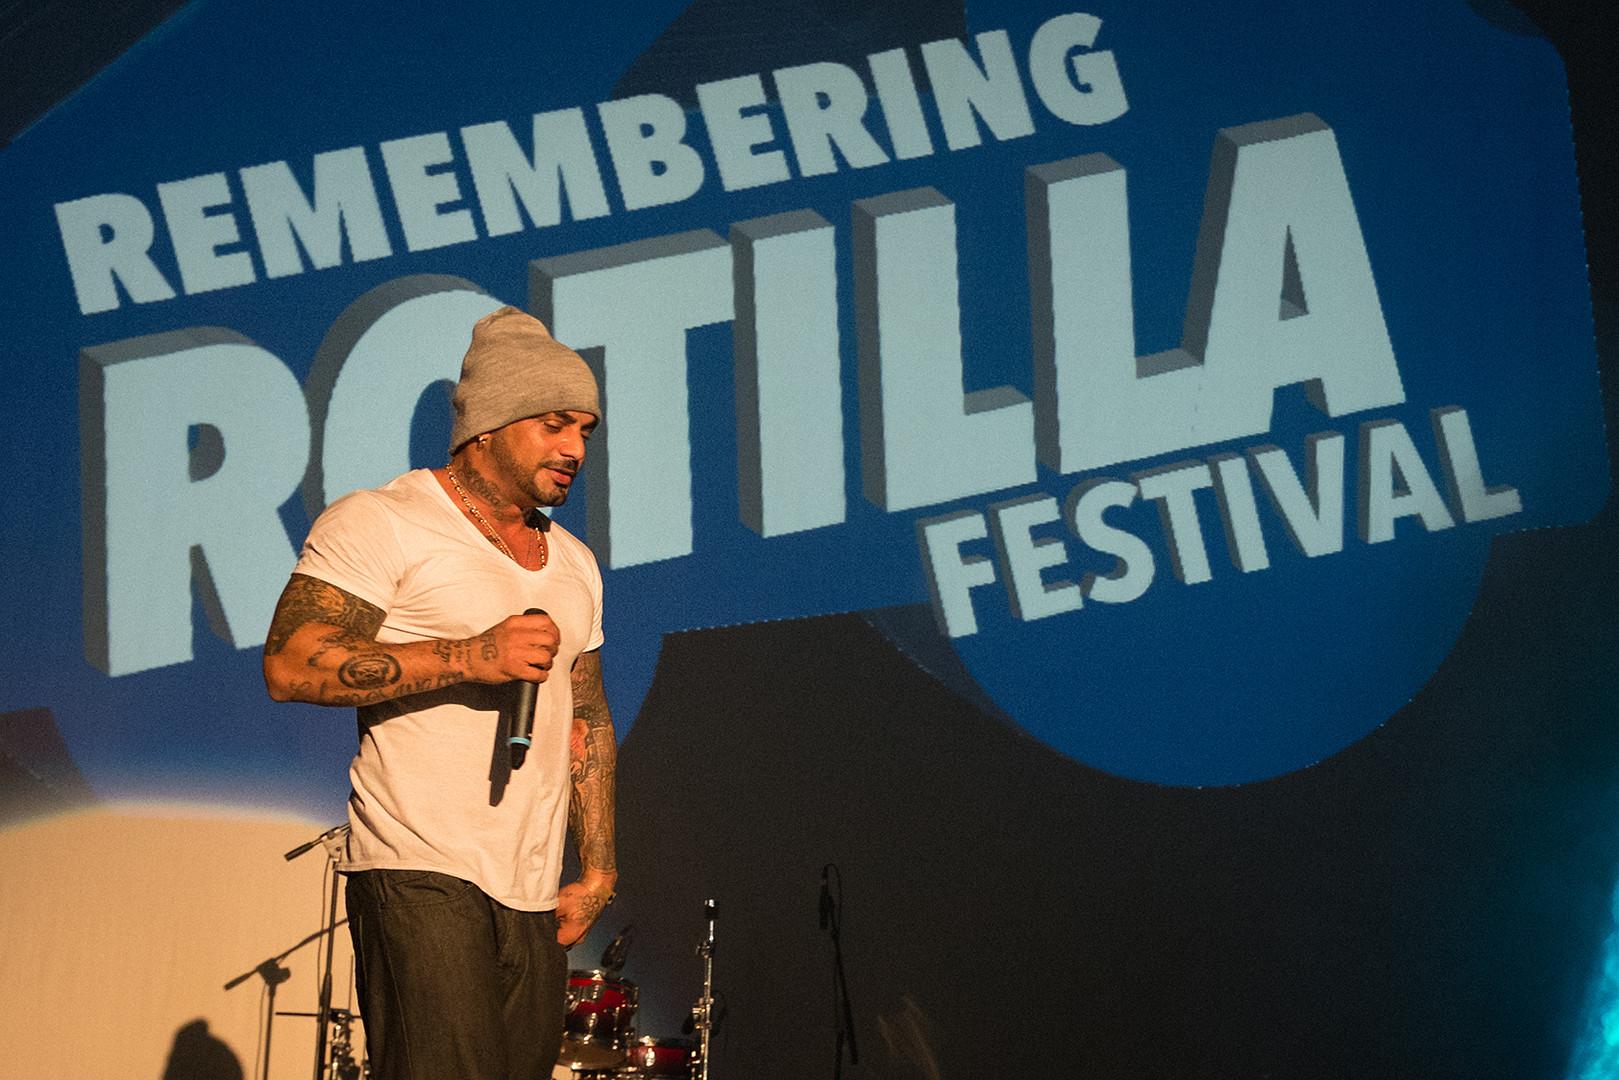 Remembering Rotilla-Festival, Manuel Artime Theater, Miami © 2017 Thomas Heckner Photographie